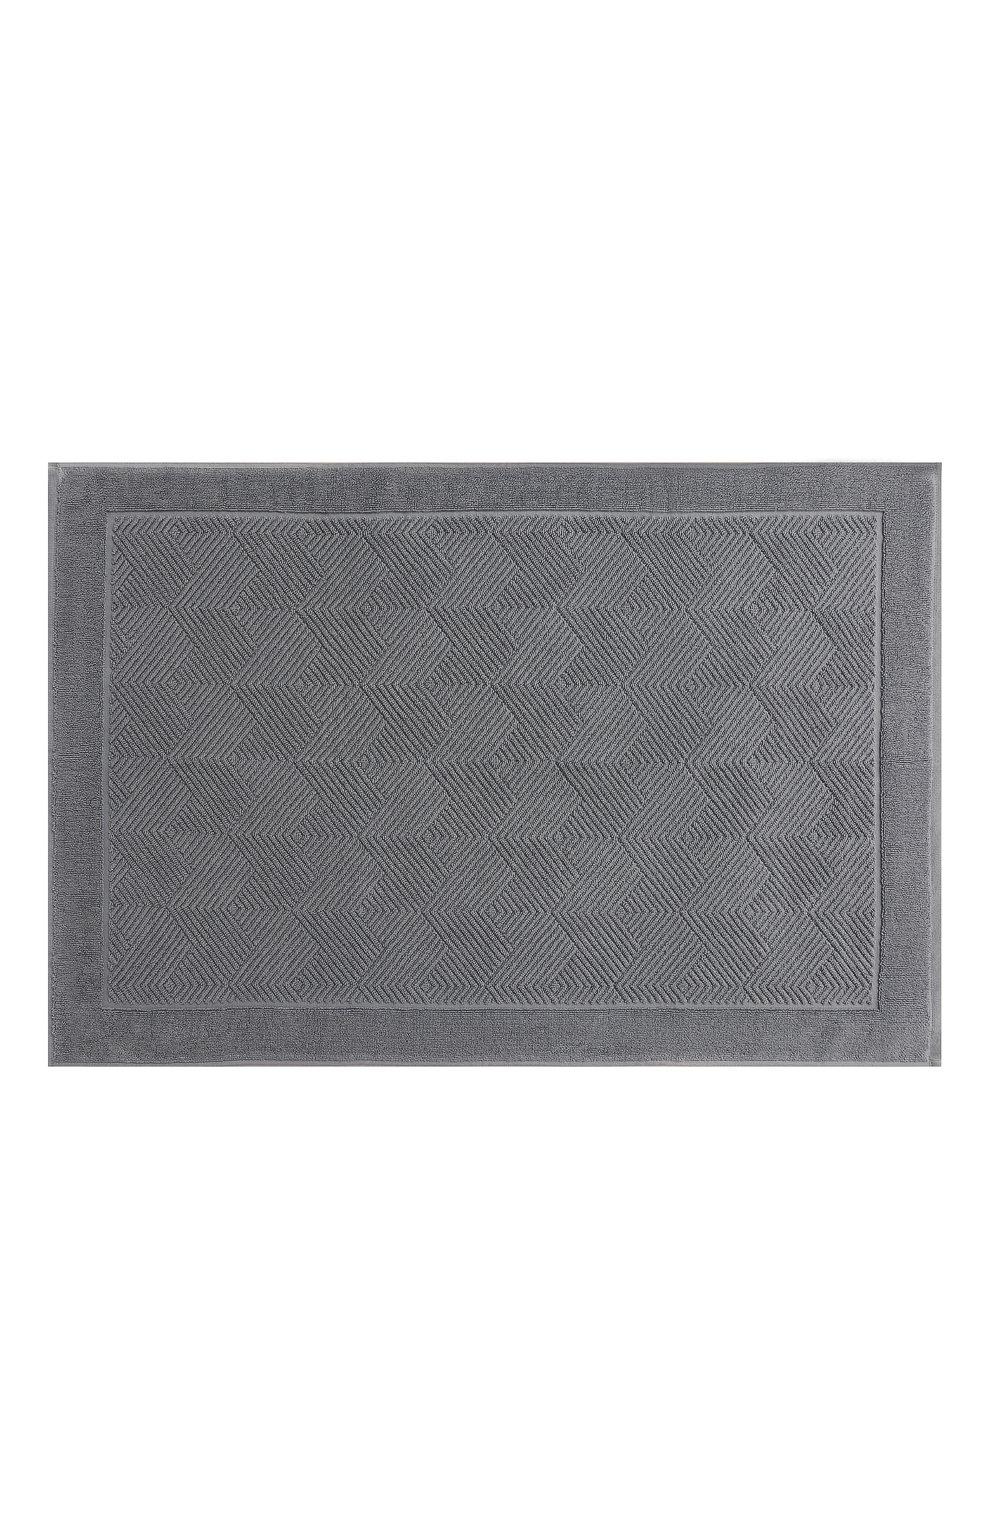 Мужского коврик для ванной комнаты FRETTE синего цвета, арт. FR6243 D0400 060E   Фото 1